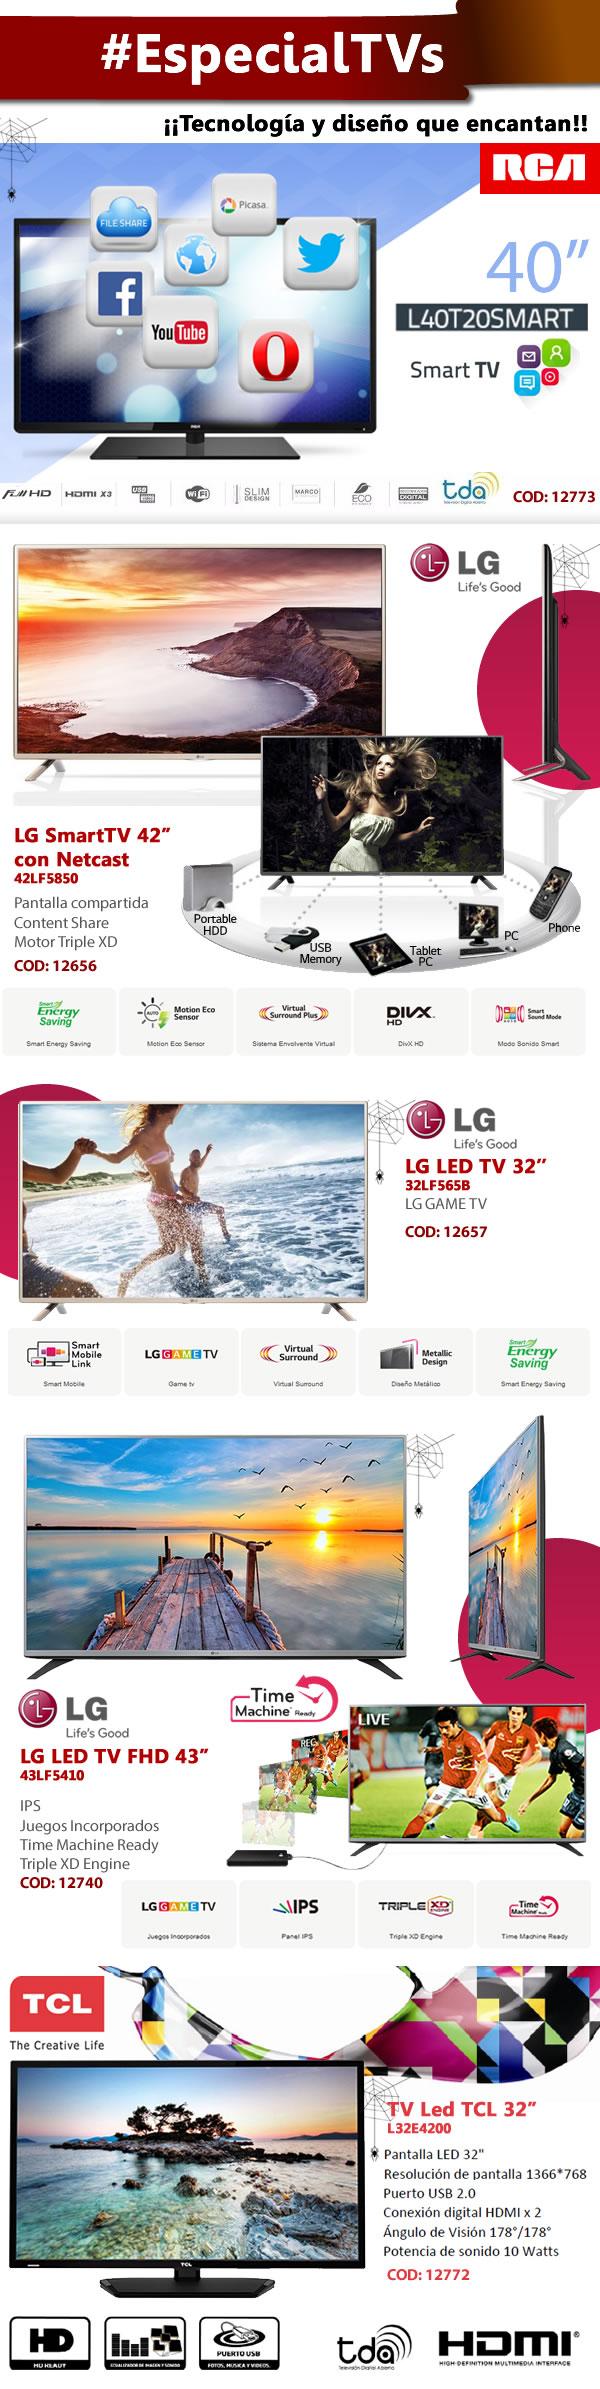 "#EspecialTVs  RCA Argentina LG Electronics Argentina TCL Argentina 32"" 40"" 42"" 43""    www.gvinformatica.com.ar #Olivos_VL #VecinosVL #FloridaEsteVL"